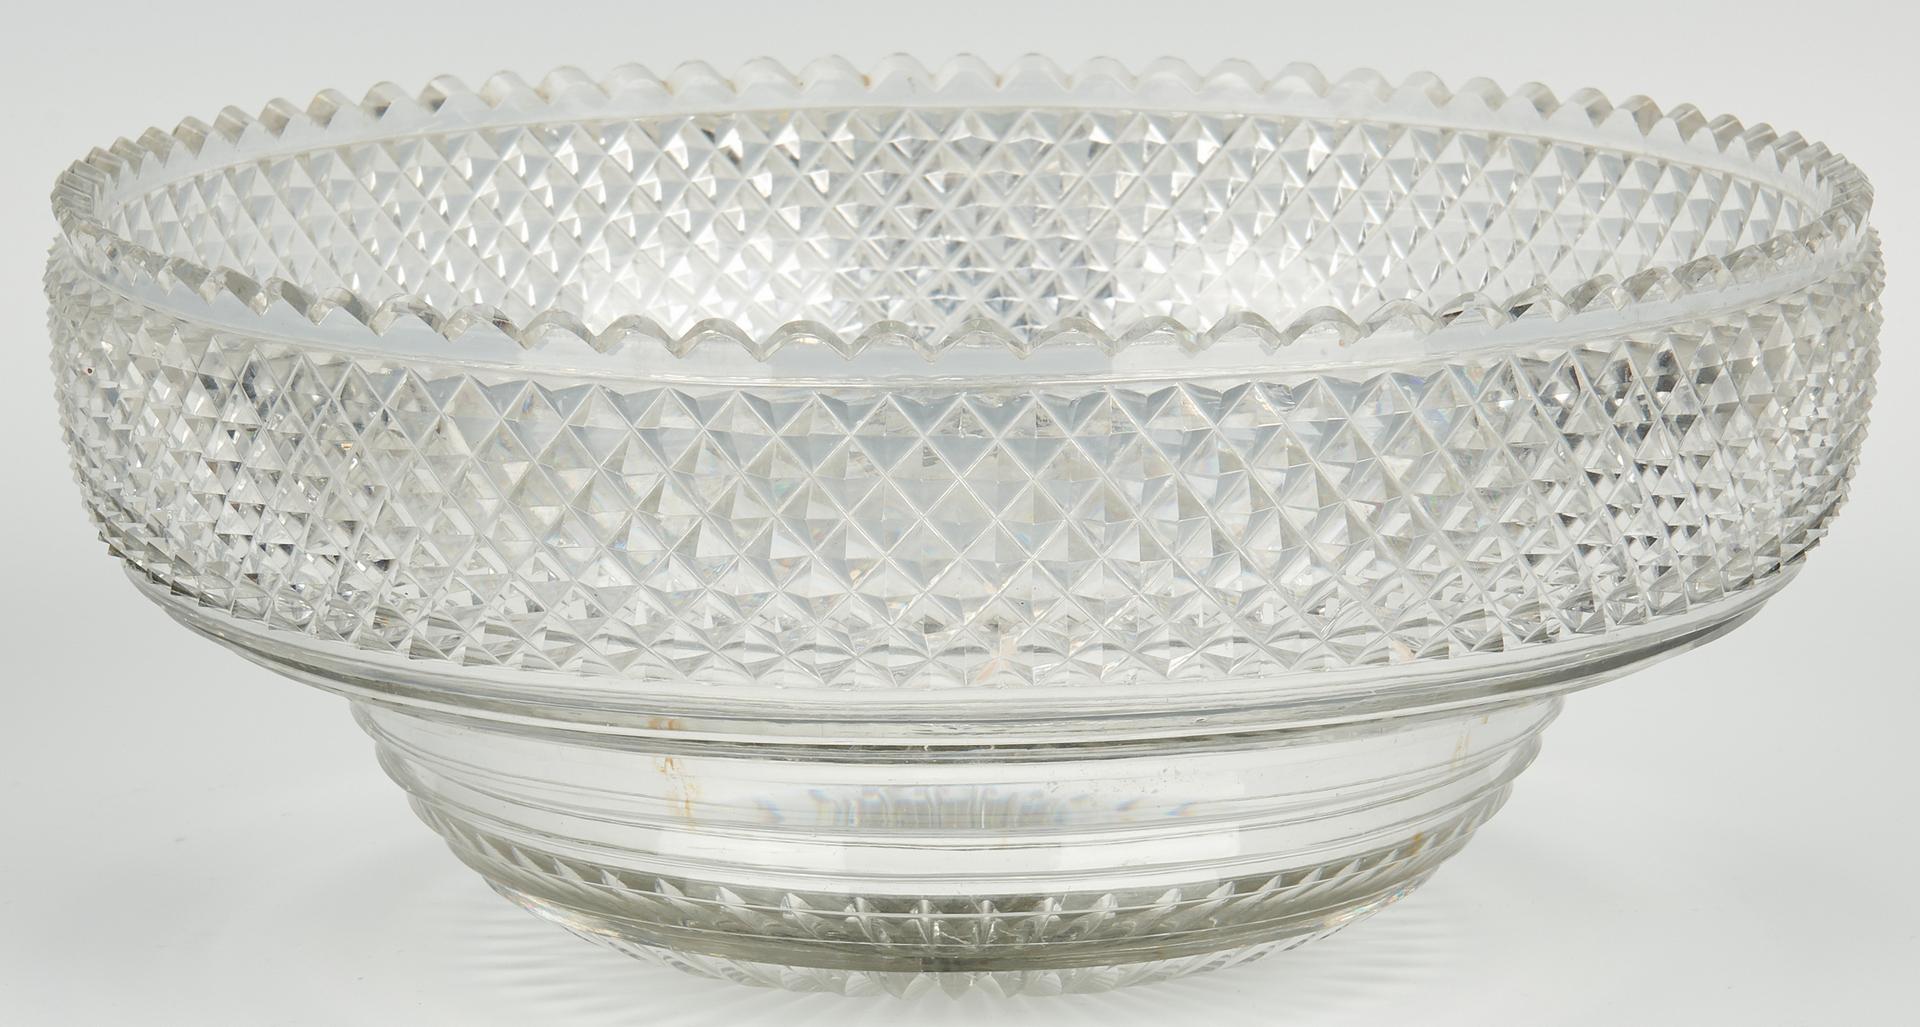 Lot 55: Emes & Barnard Georgian Sterling Centerpiece with Cut Glass Bowl